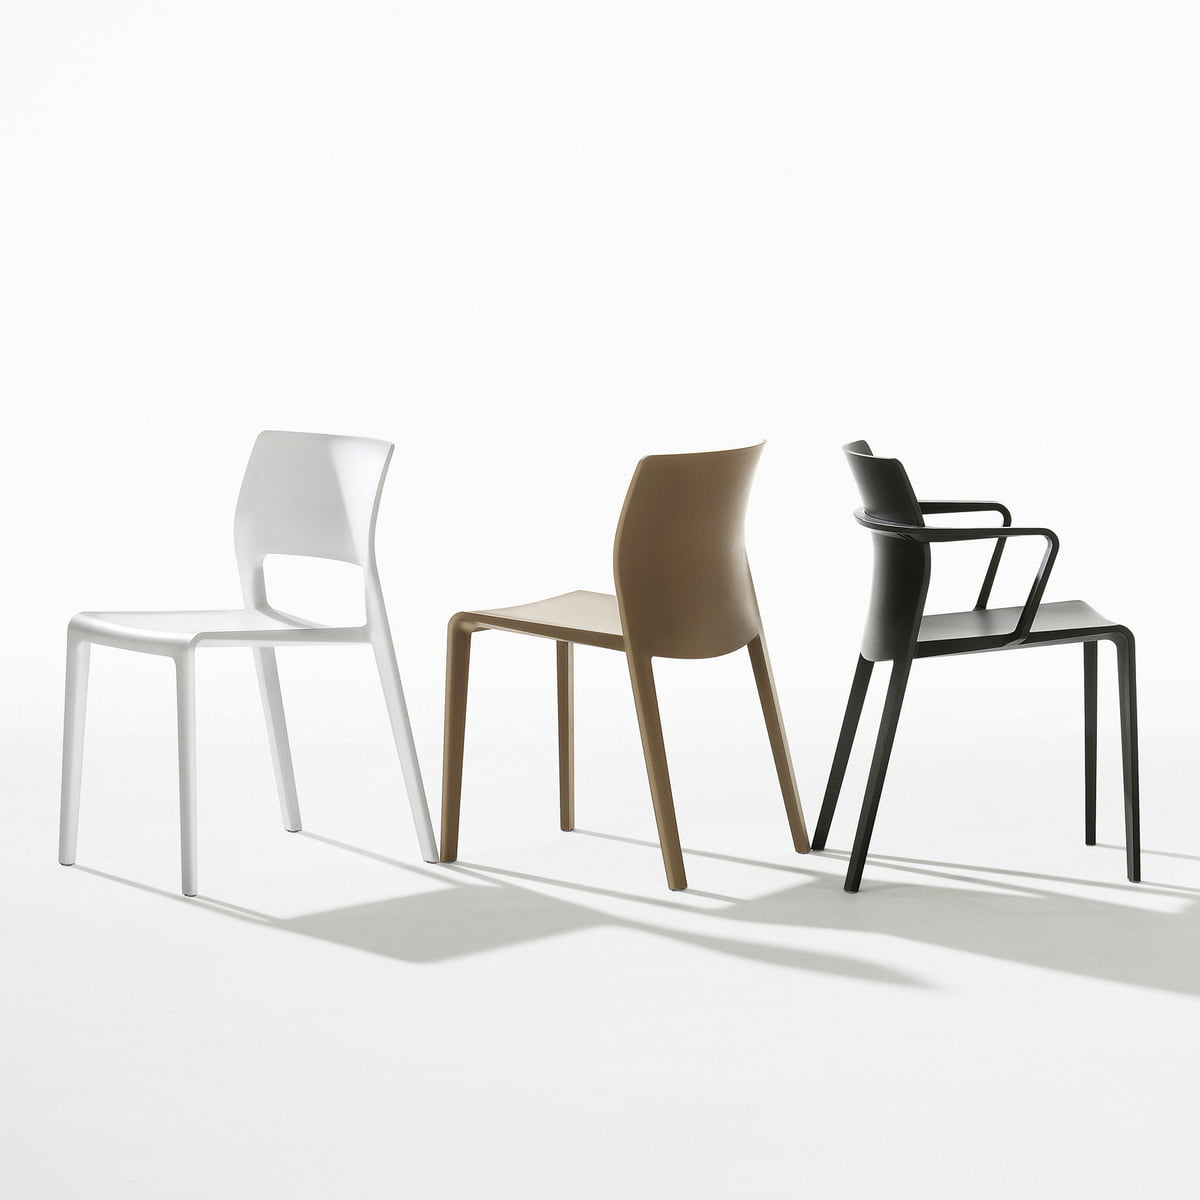 Juno chair by Arper in our interior design shop